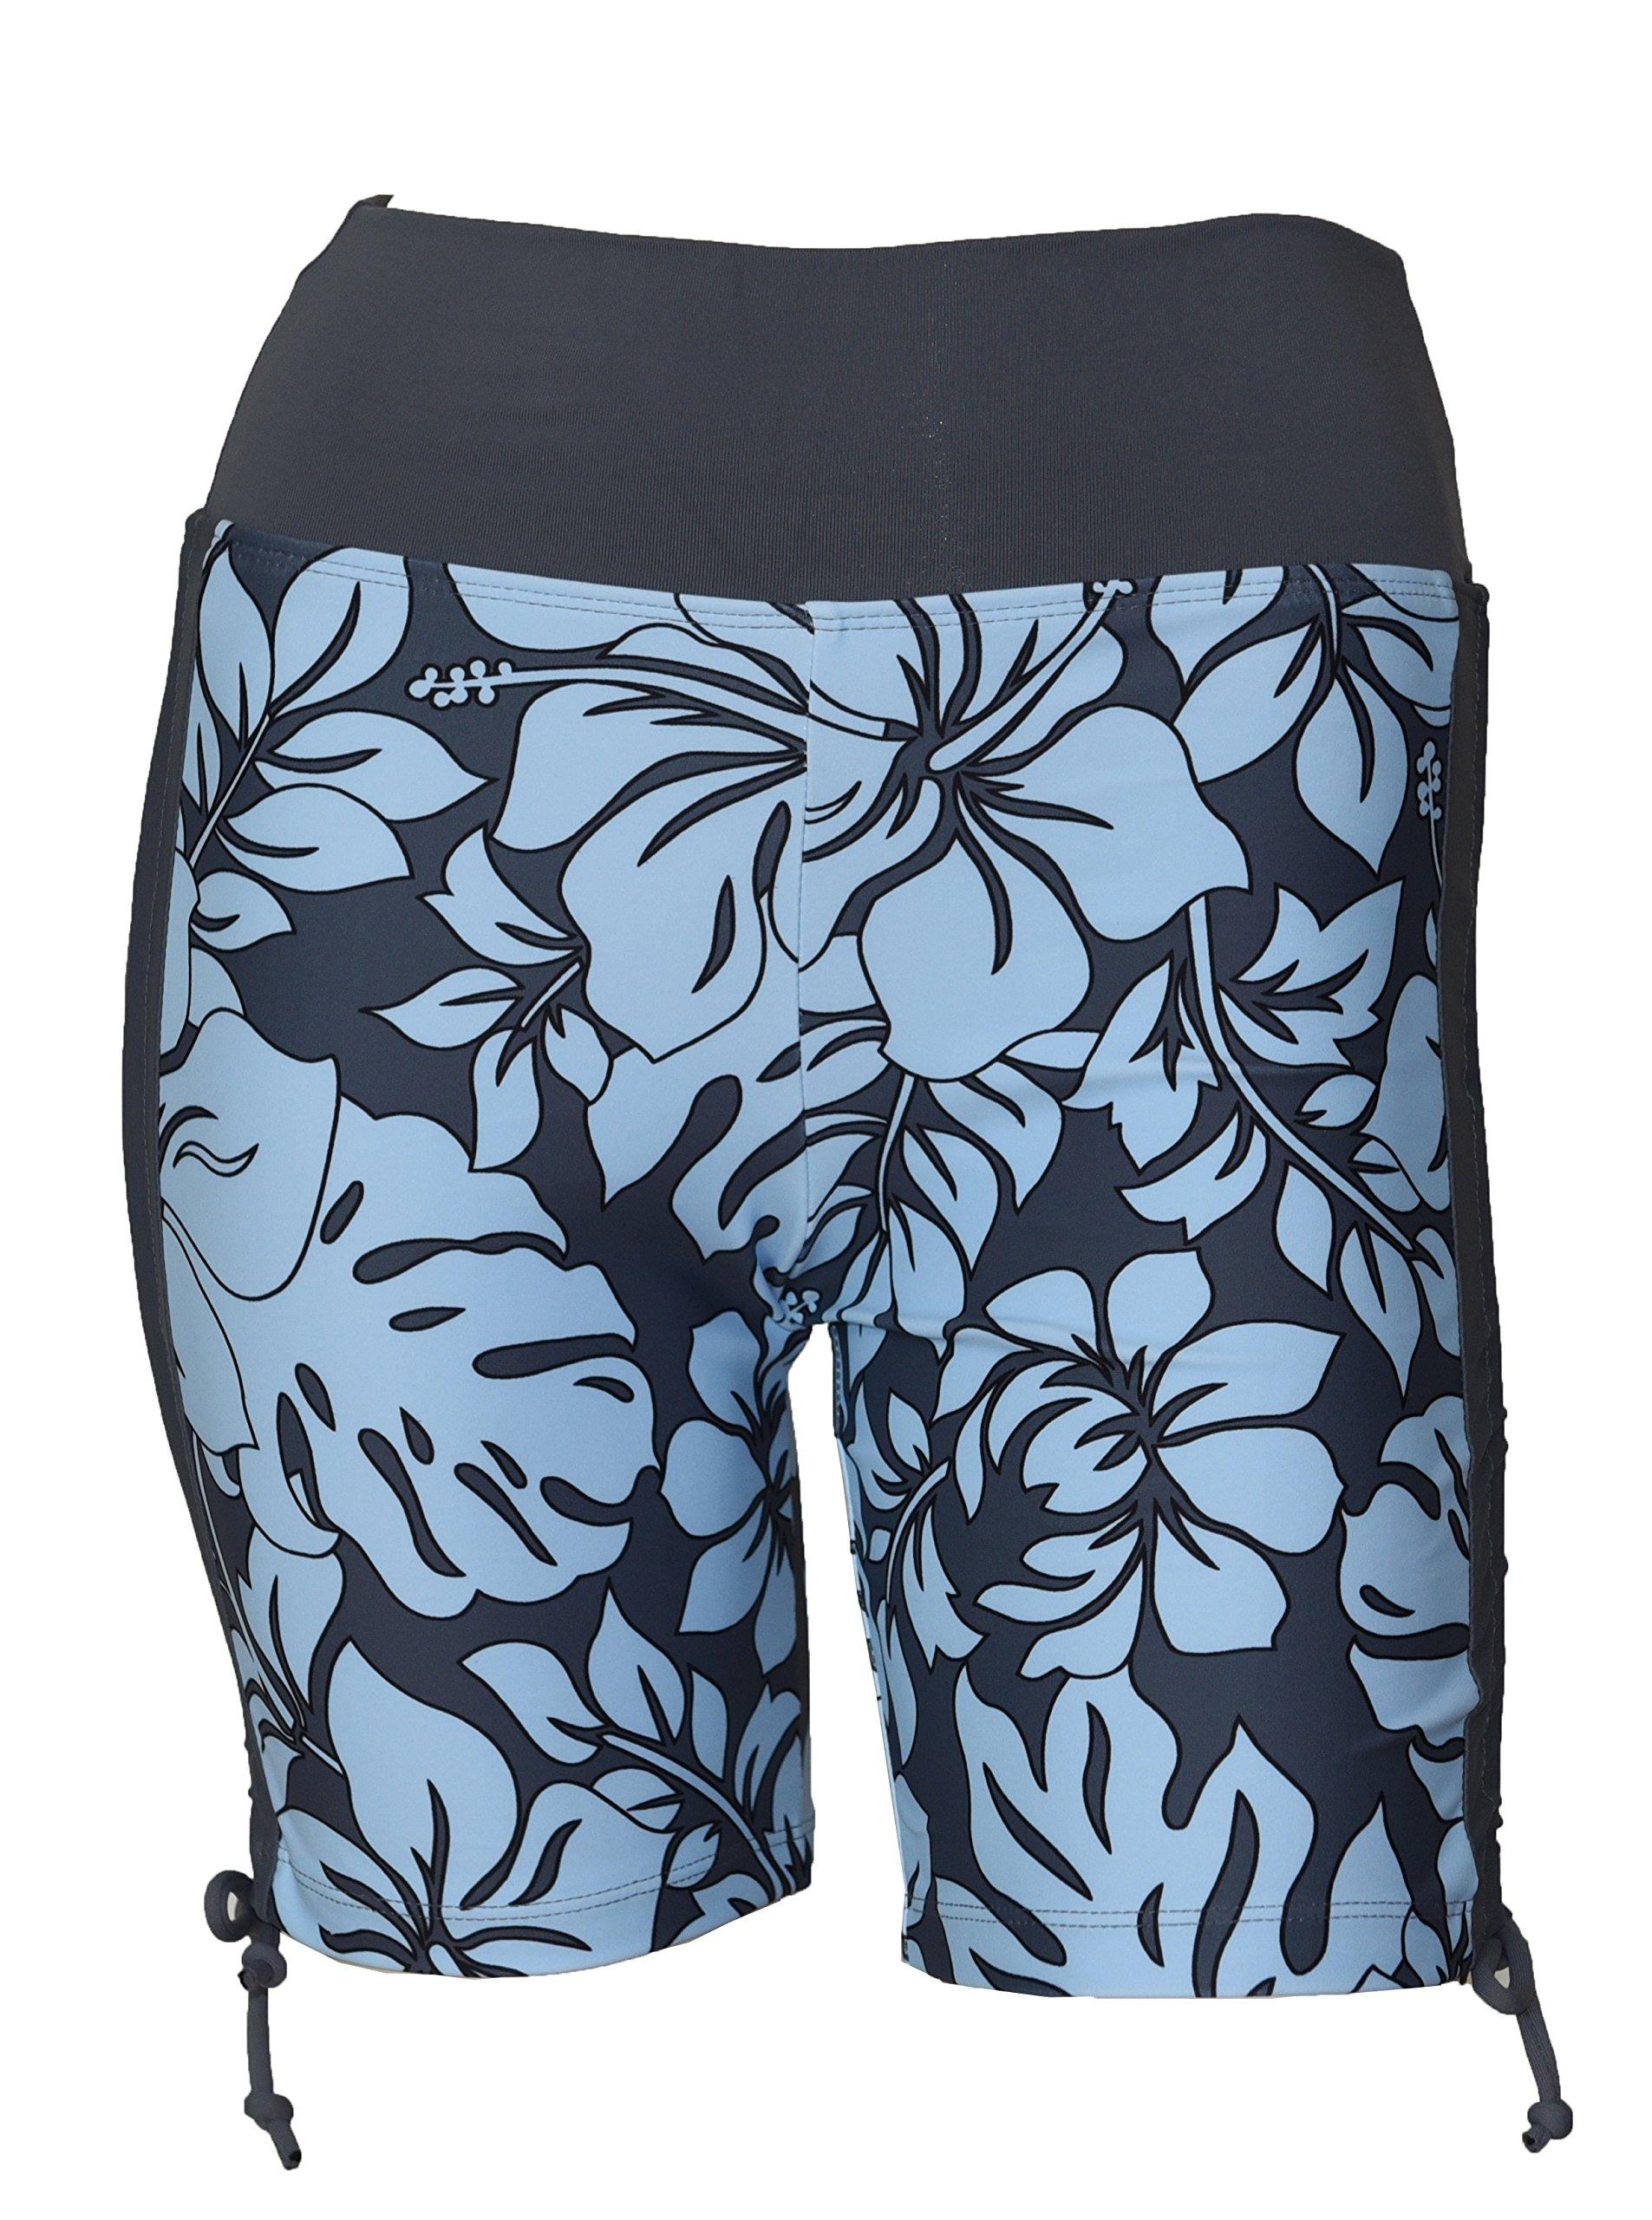 Private Island Women UV Swim Rash Guard Board Shorts Pants Yoga (XXXL, GwB) by Private Island